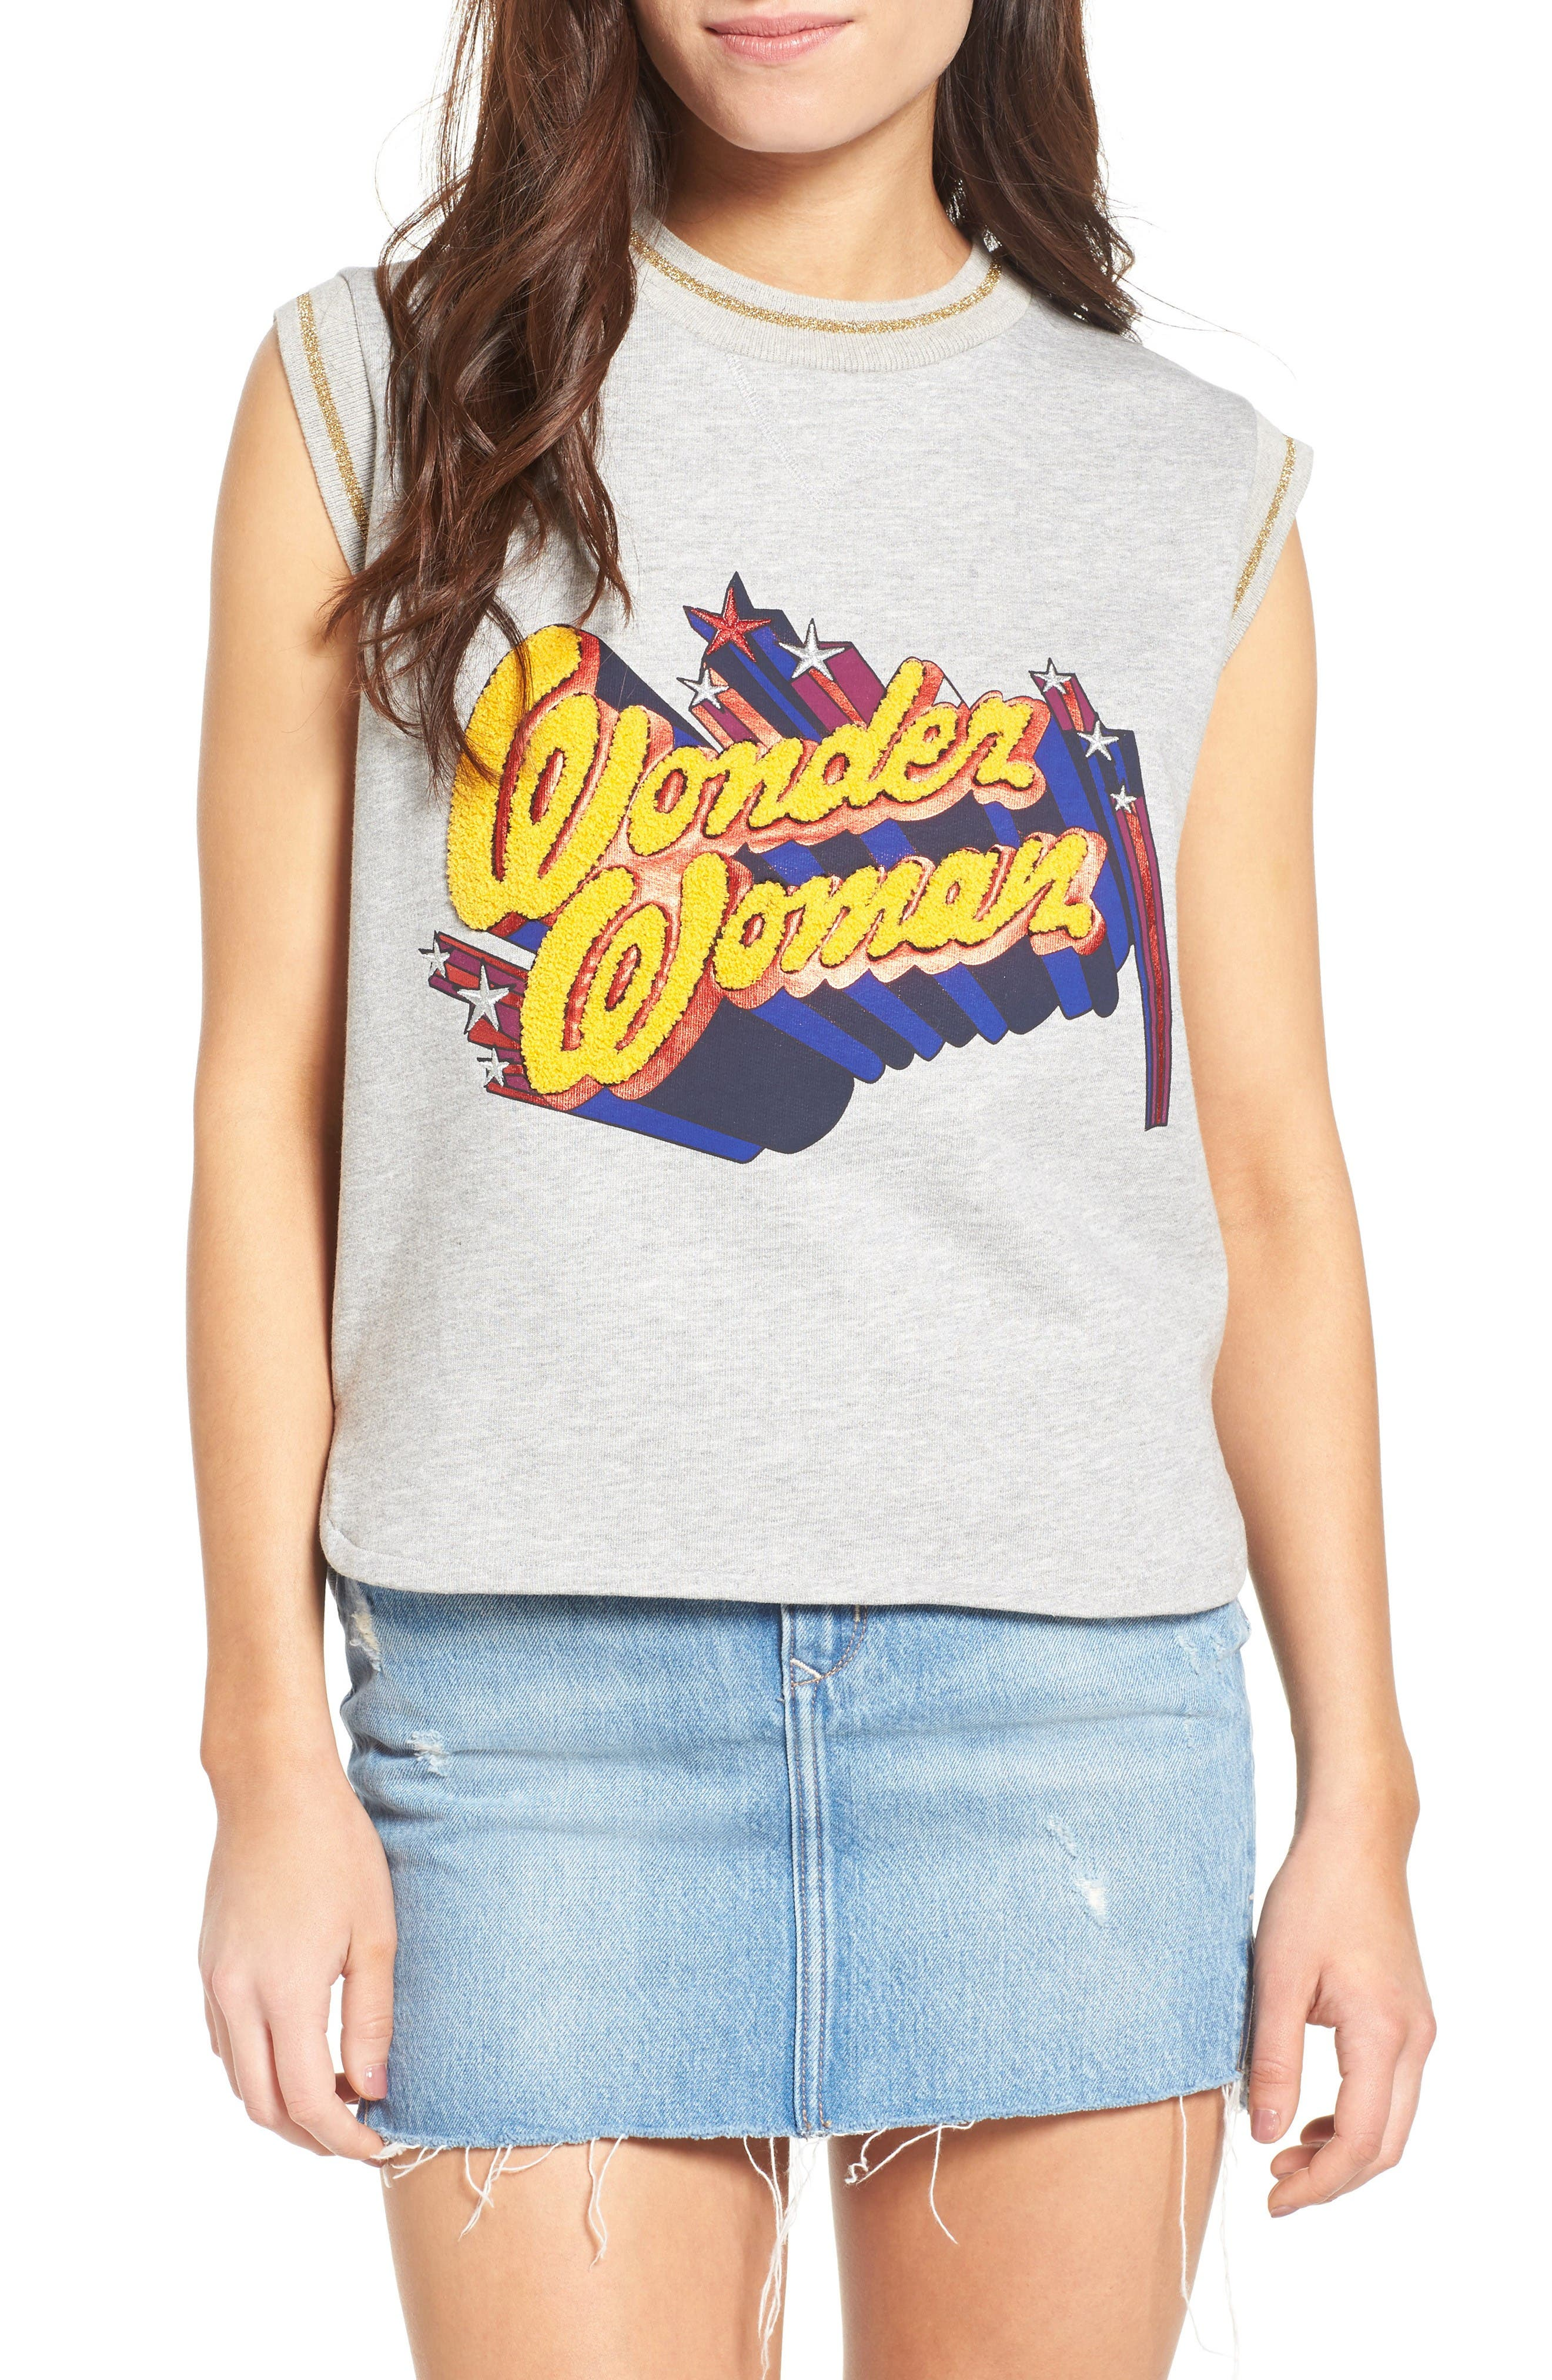 Paul & Joe Sister Wonder Woman Sleeveless Sweatshirt